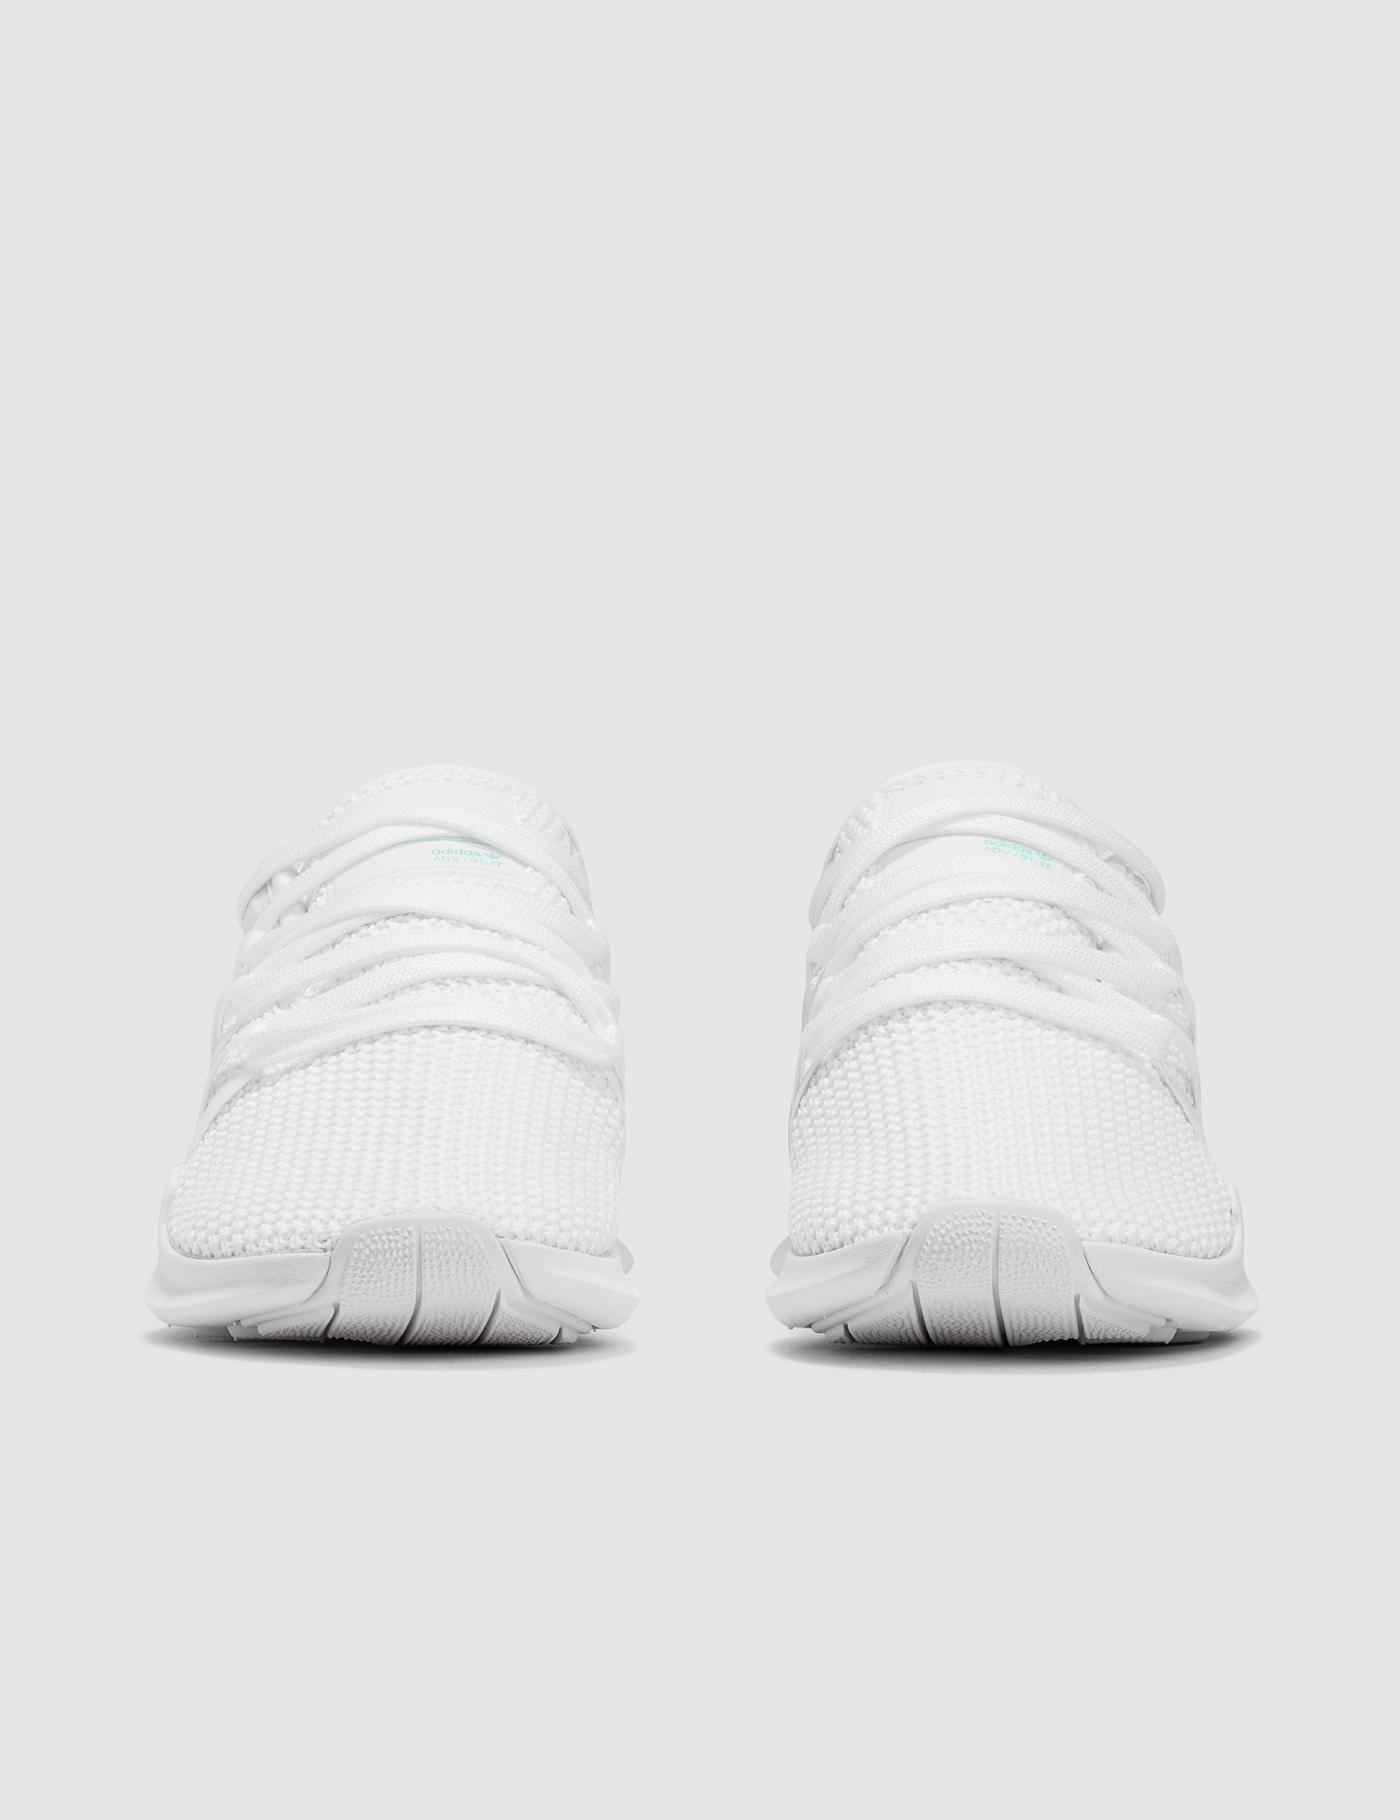 Adidas EQT Support ADV PK Ftwr White/Ftwr White/Sub Green BY9391